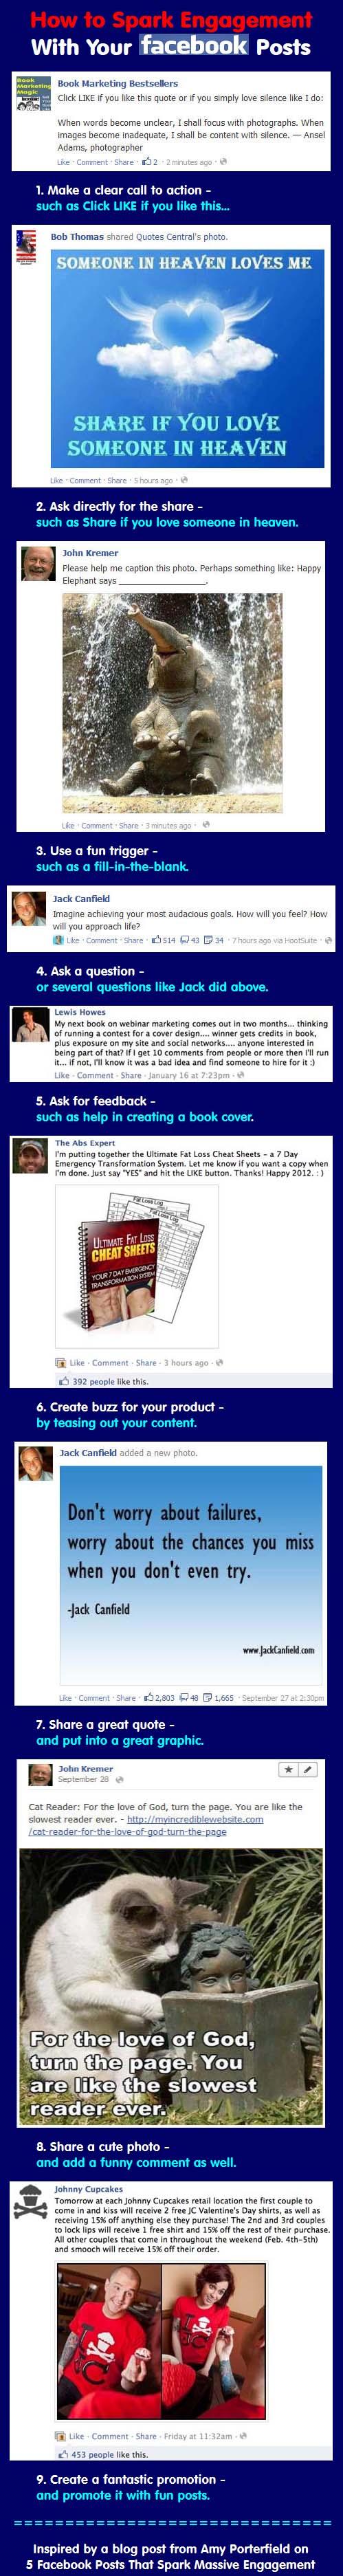 9 Facebook Posts